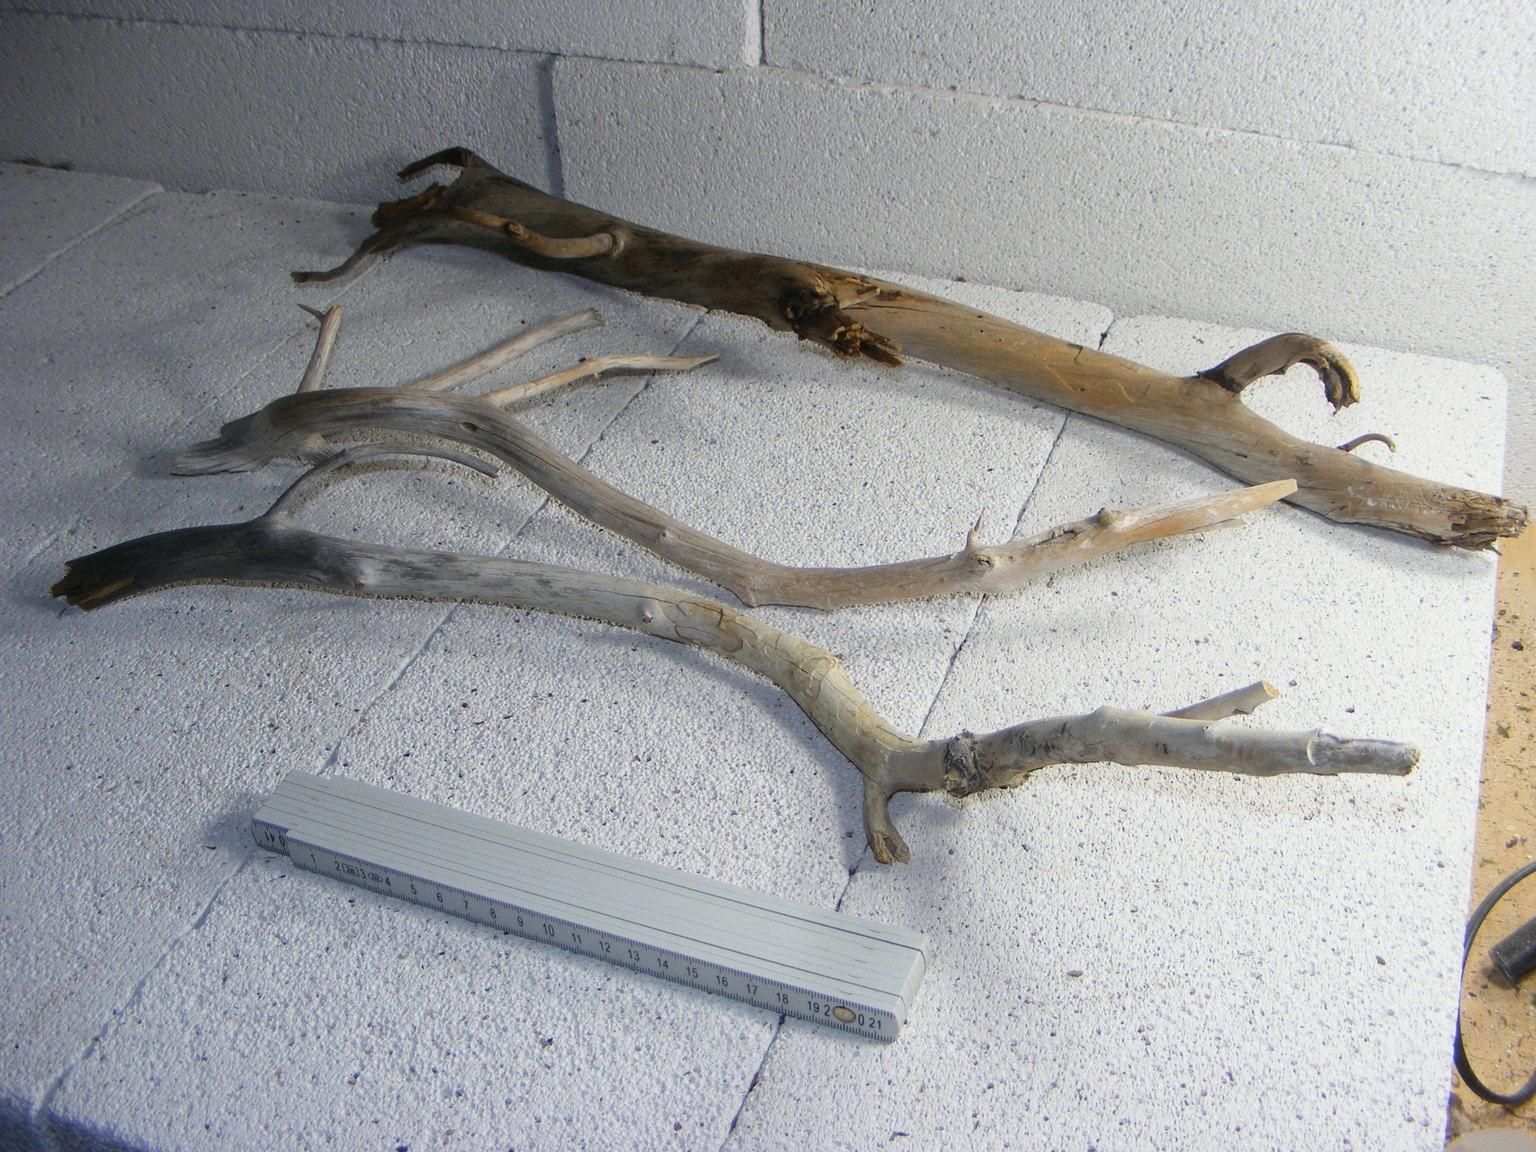 3 stk treibholz schwemmholz vom strand driftwood. Black Bedroom Furniture Sets. Home Design Ideas